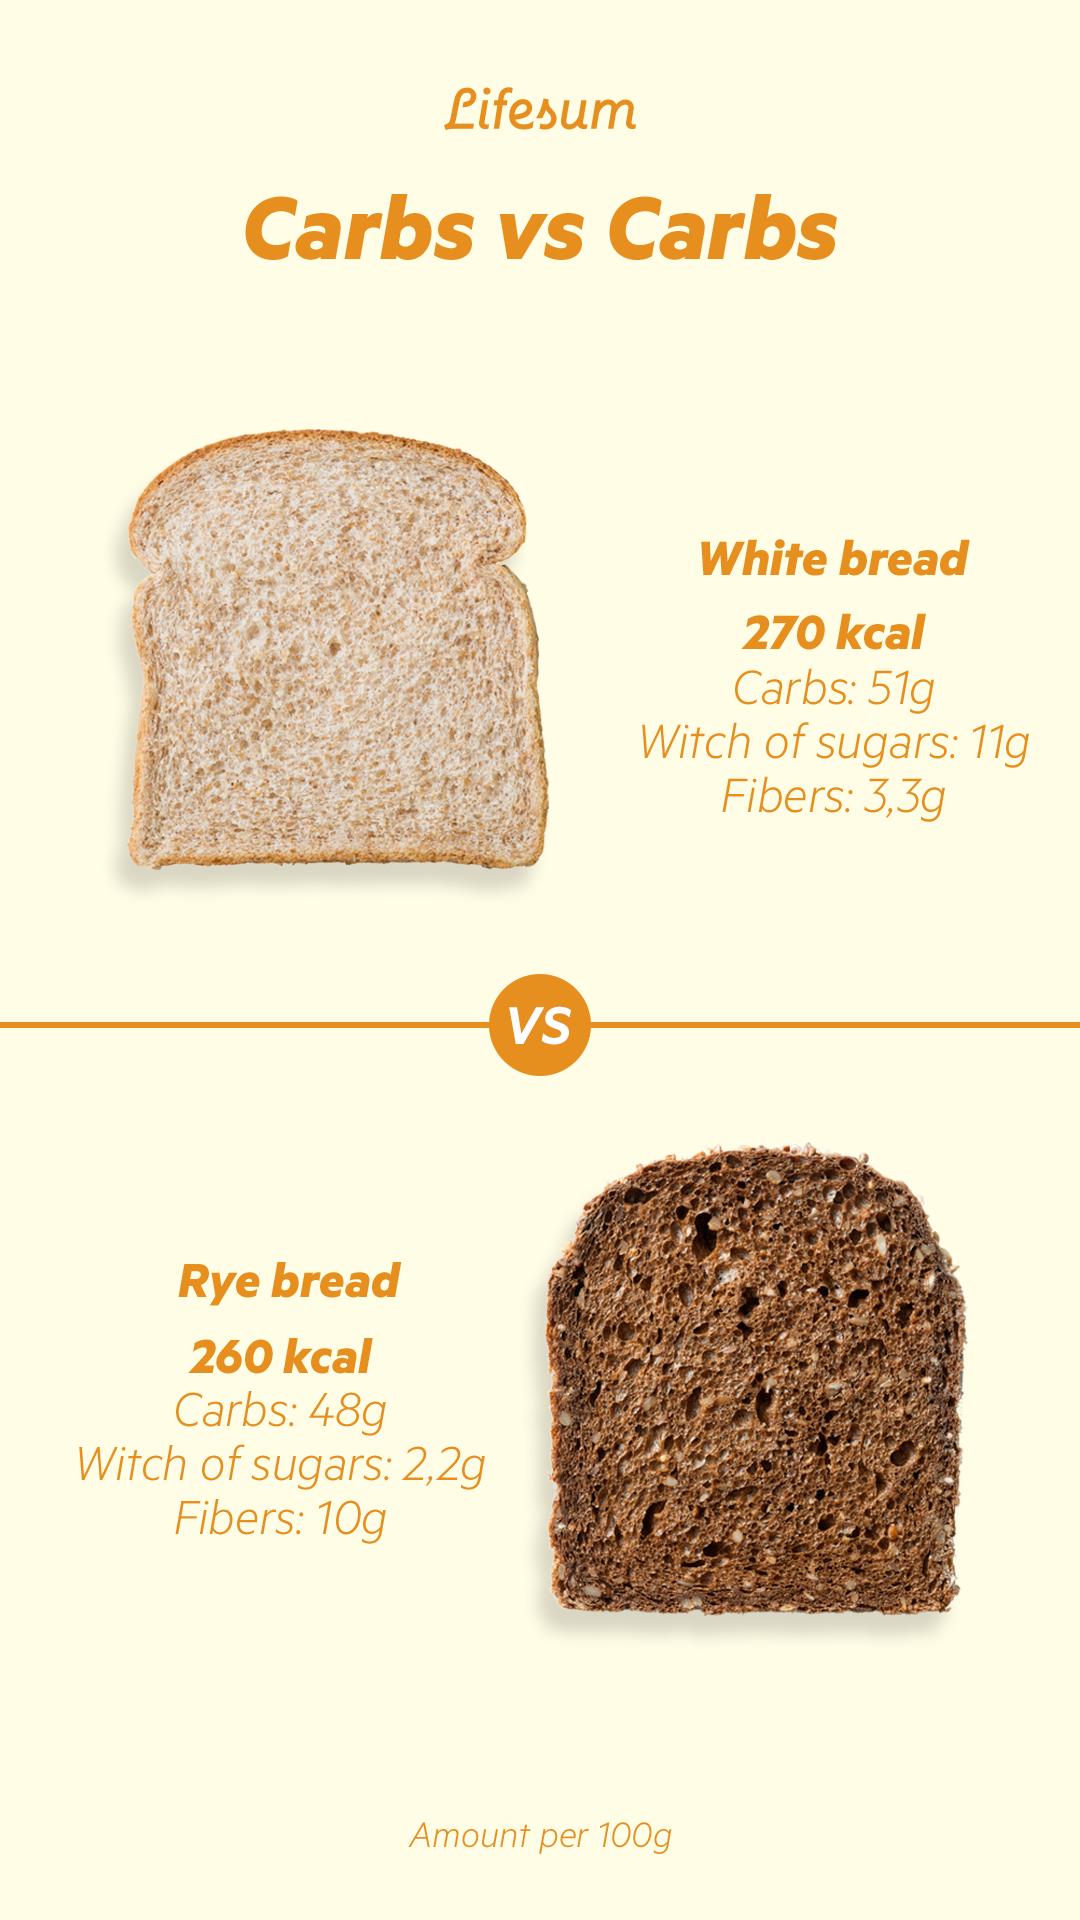 Carbs vs carbs